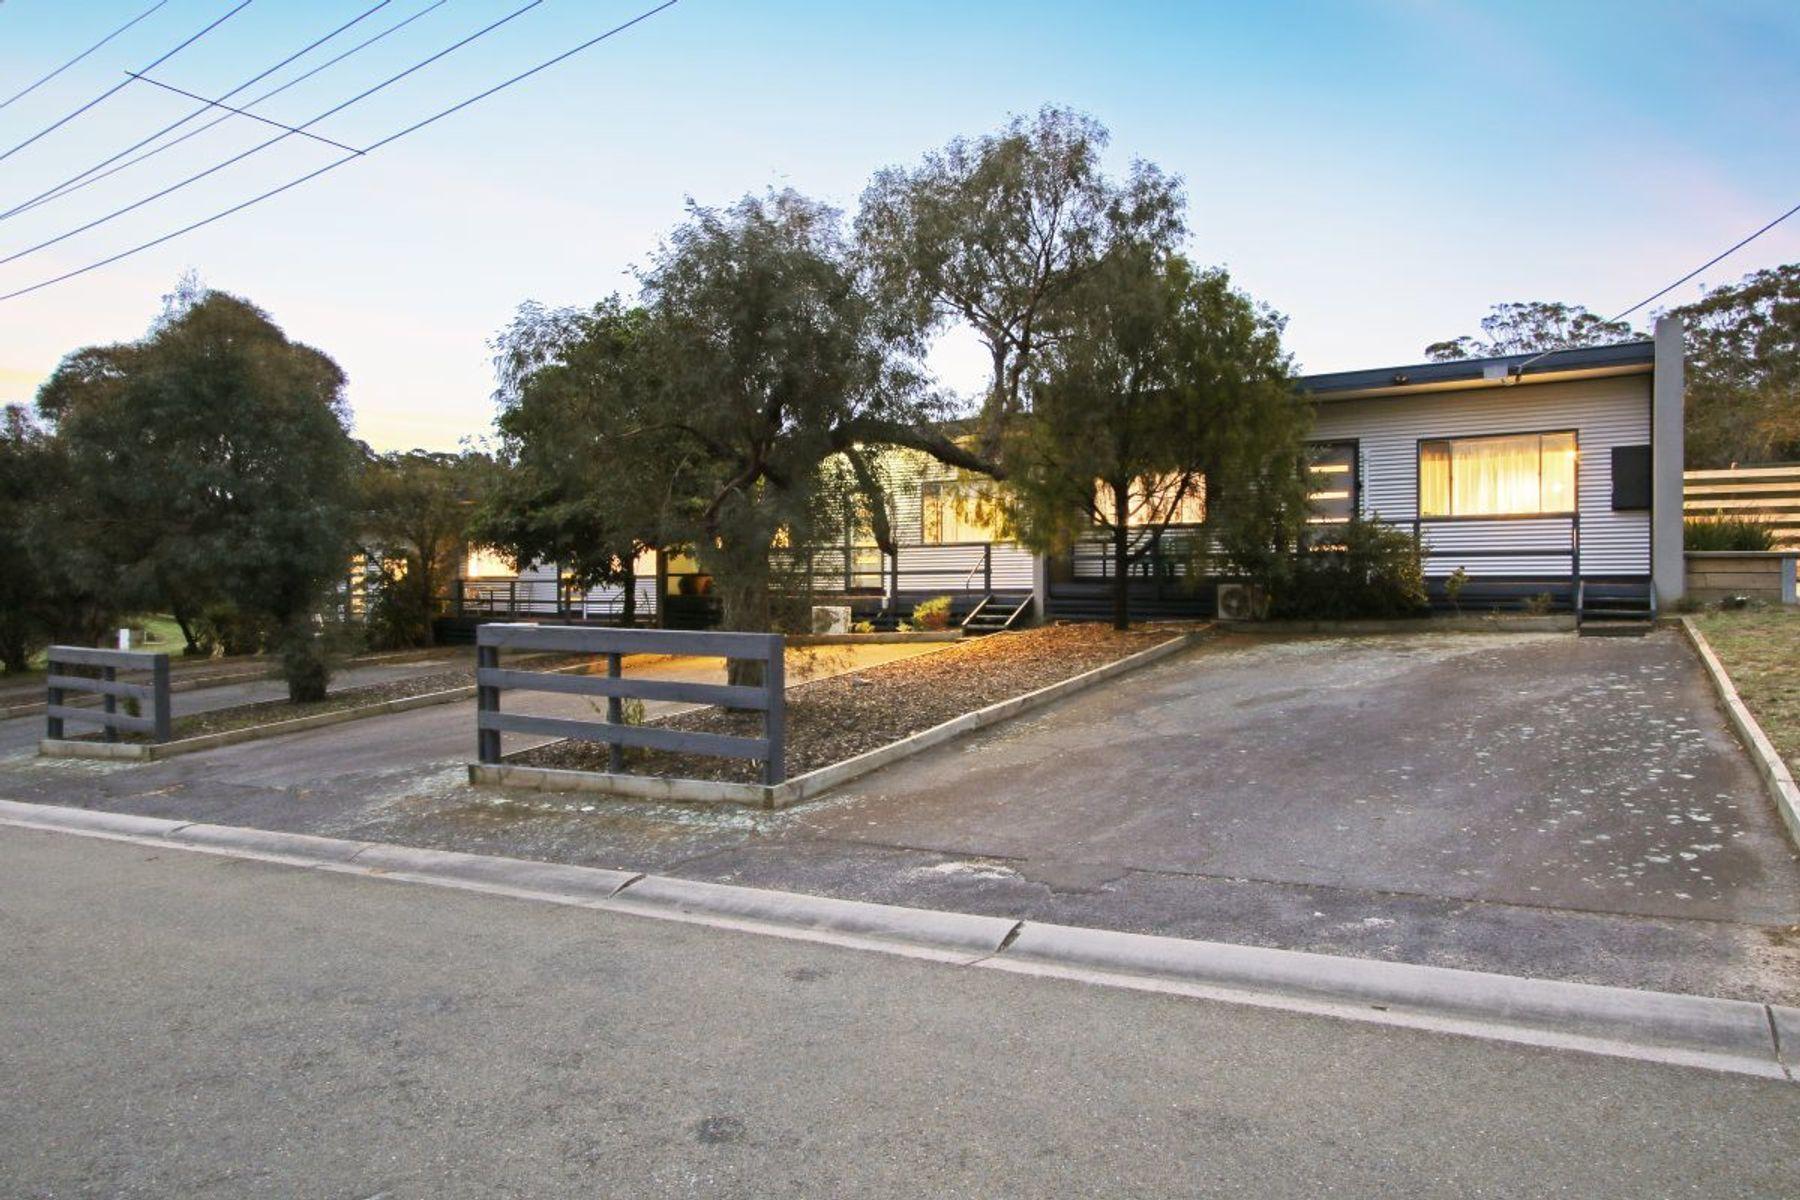 51 Stirling Road, Metung, VIC 3904